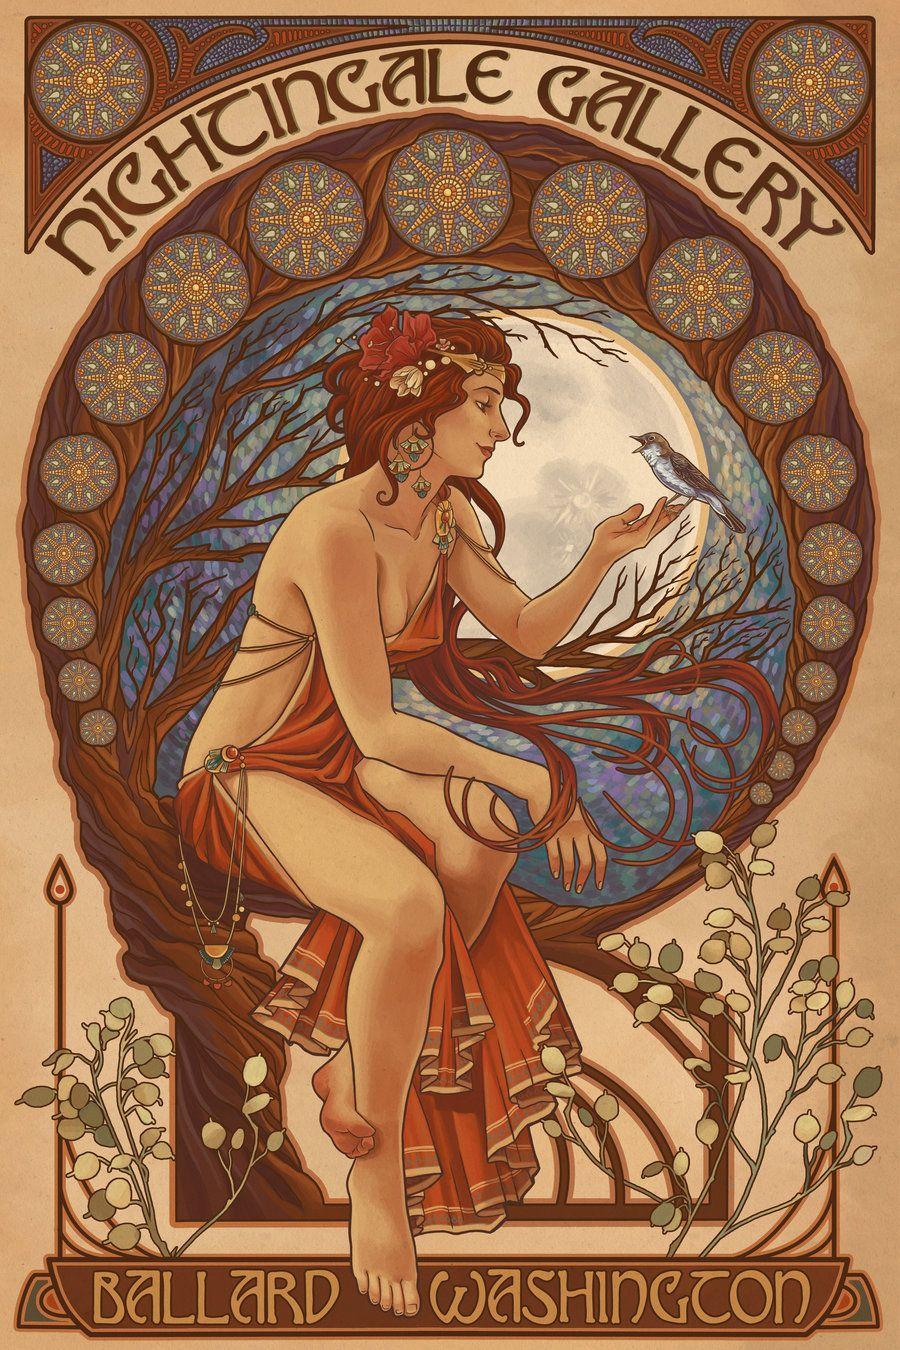 Nightingale Gallery Poster by Chronoperates.deviantart.com on @deviantART